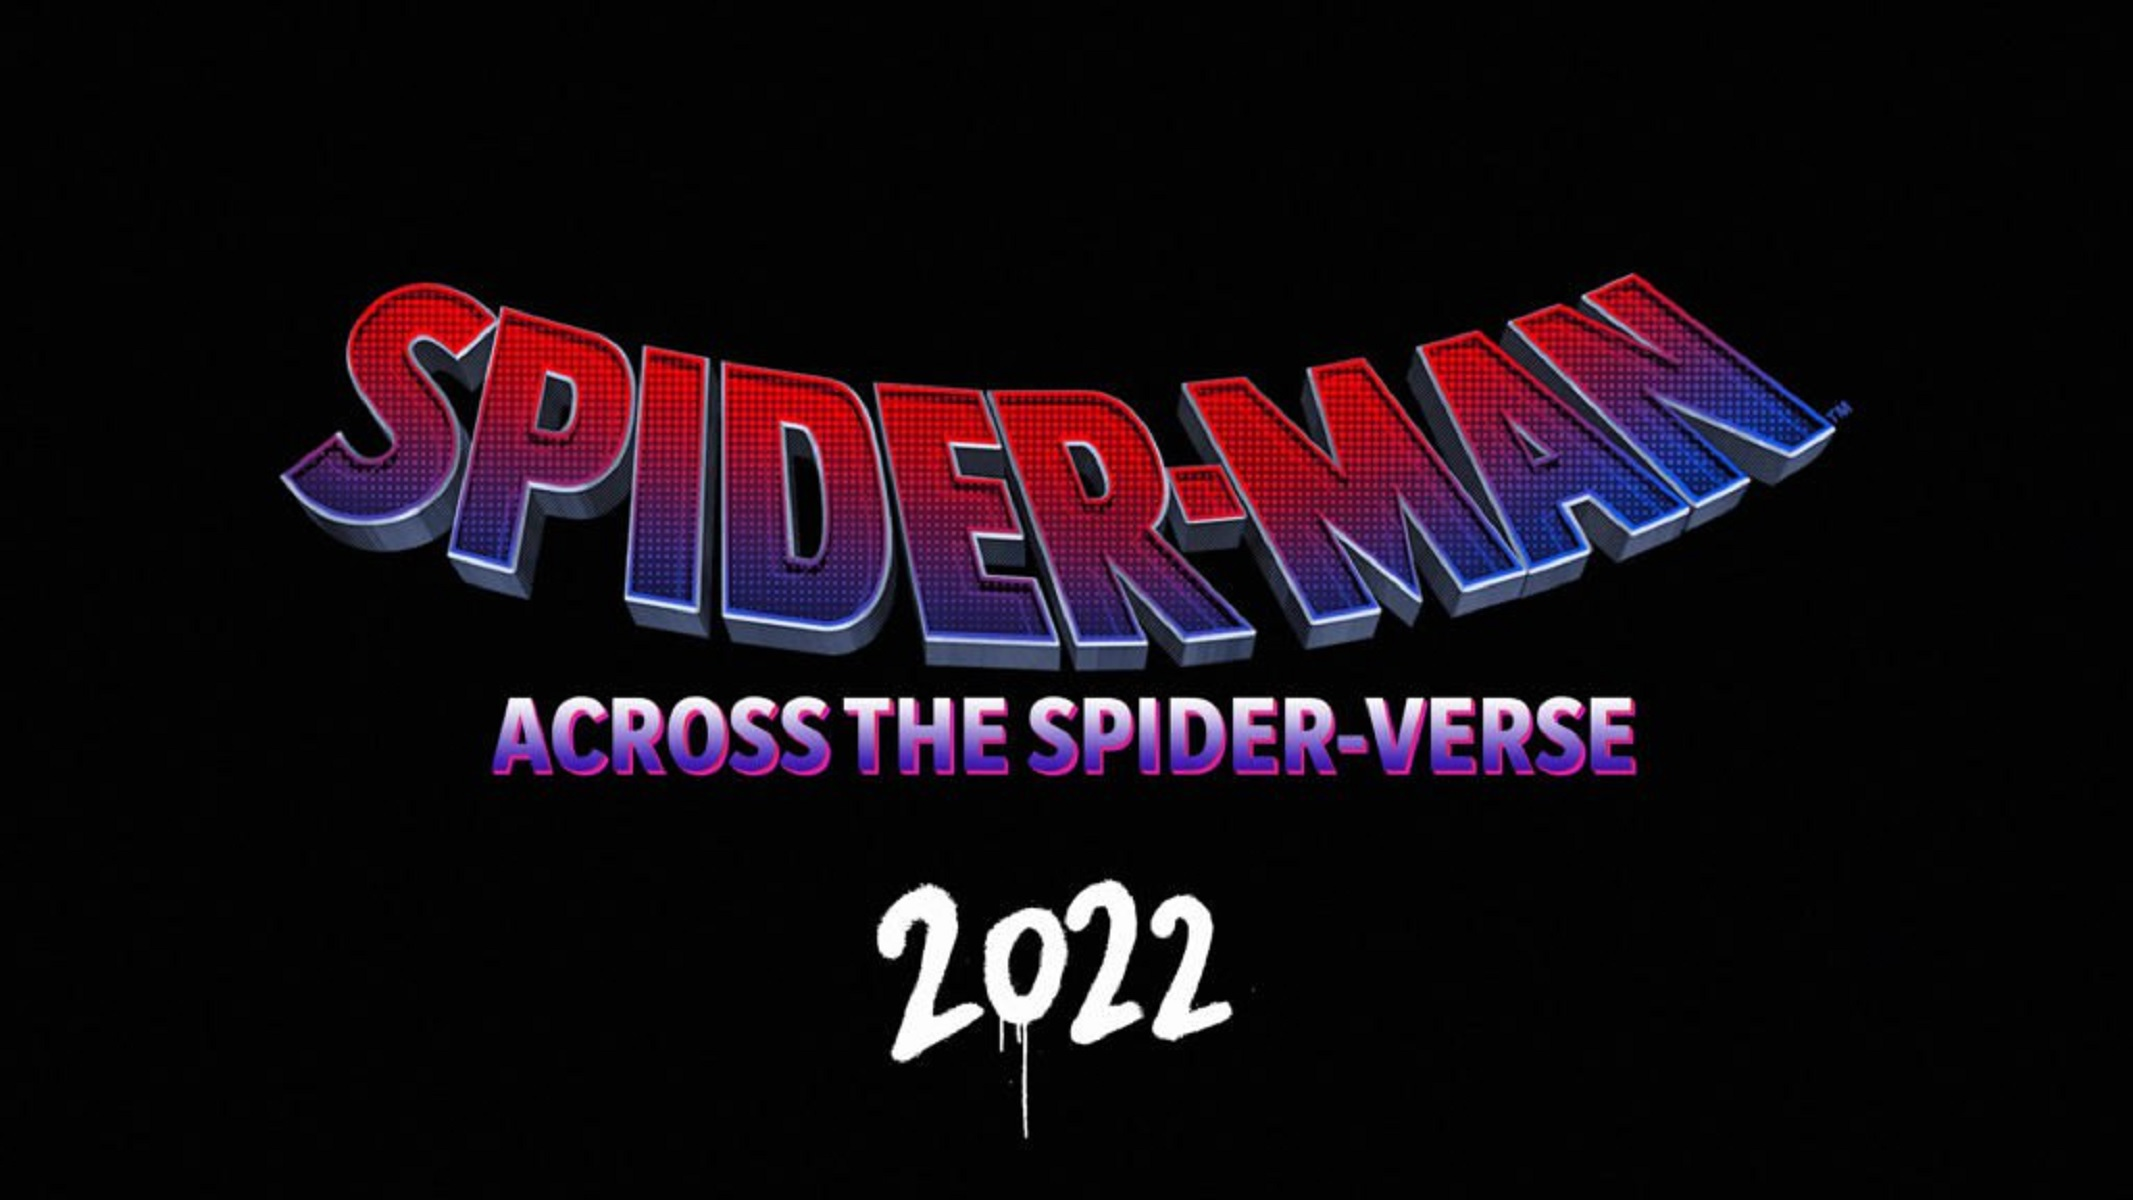 Spider-Man: Accross the Spider-Verse